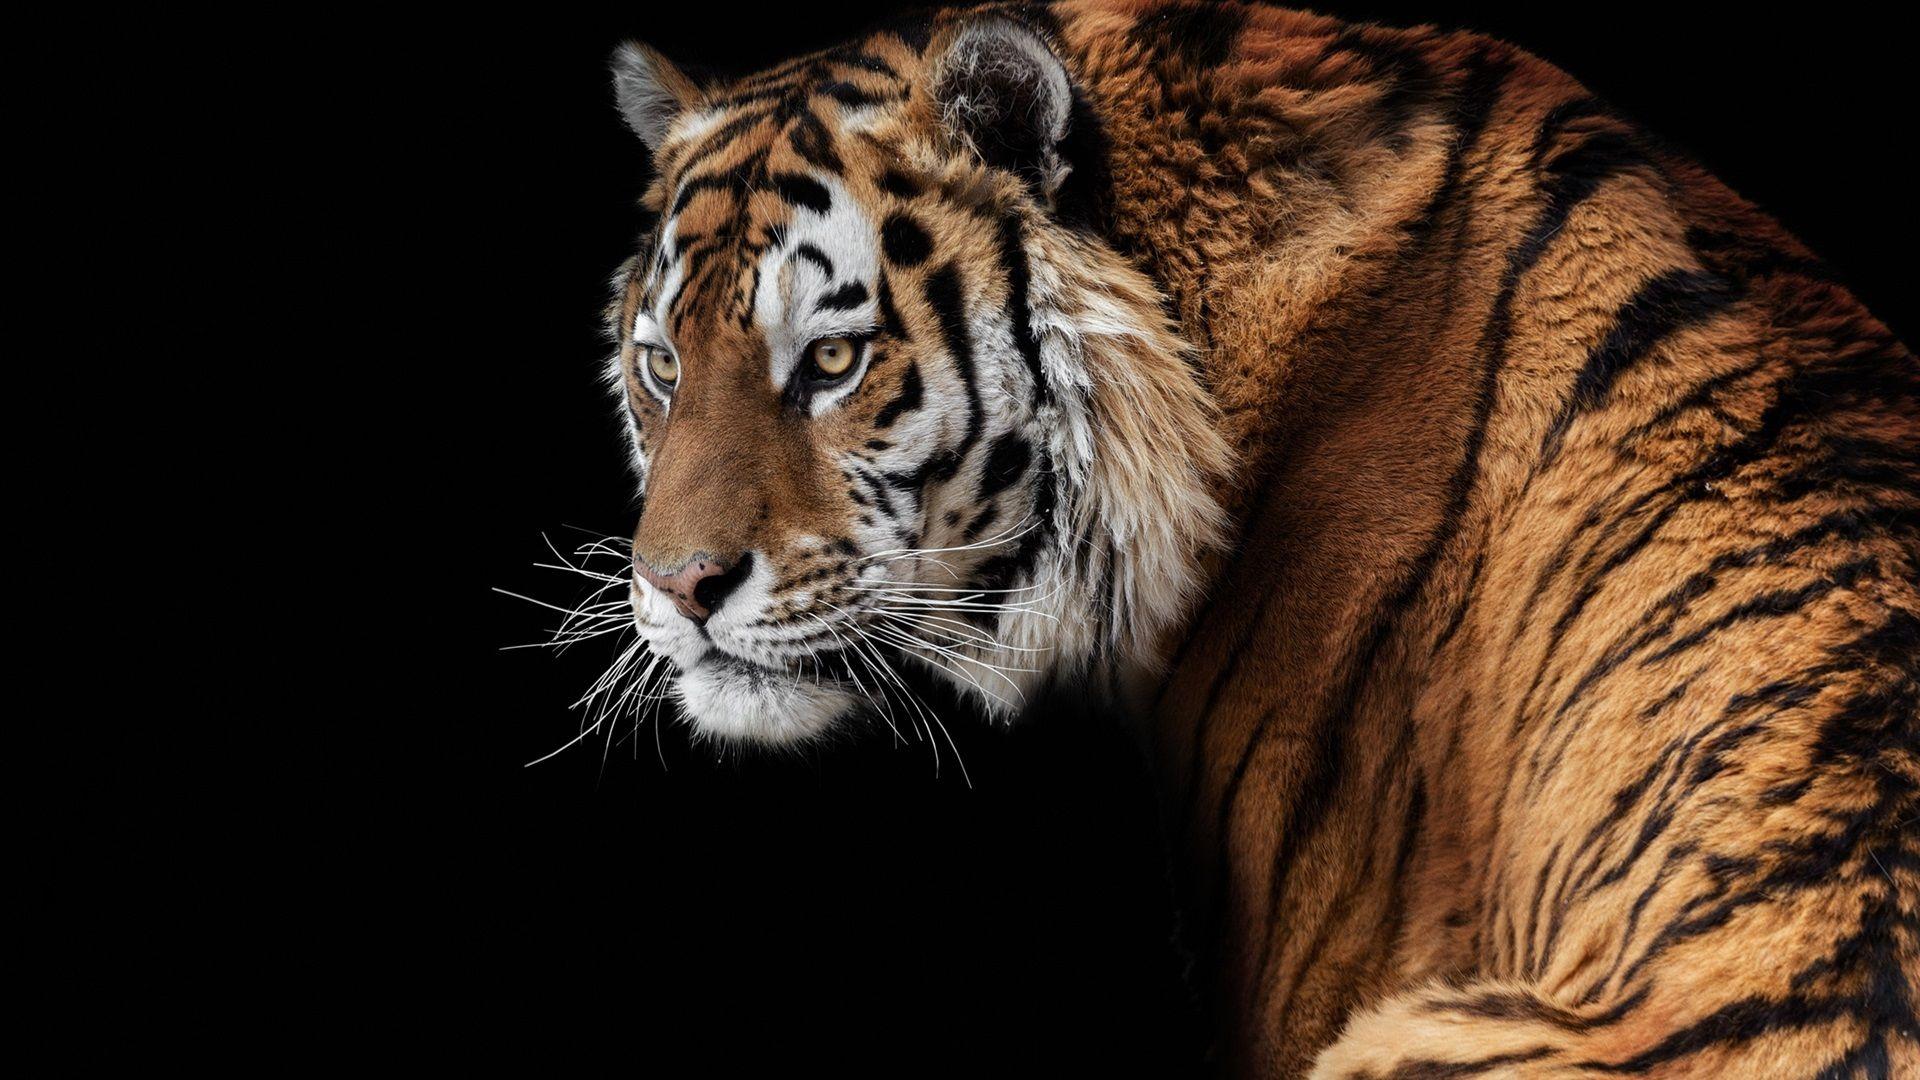 1920x1080 Full Hd Wallpaper Amur Tiger Look Back Face Black Background Tiger Images Amur Tiger Tiger